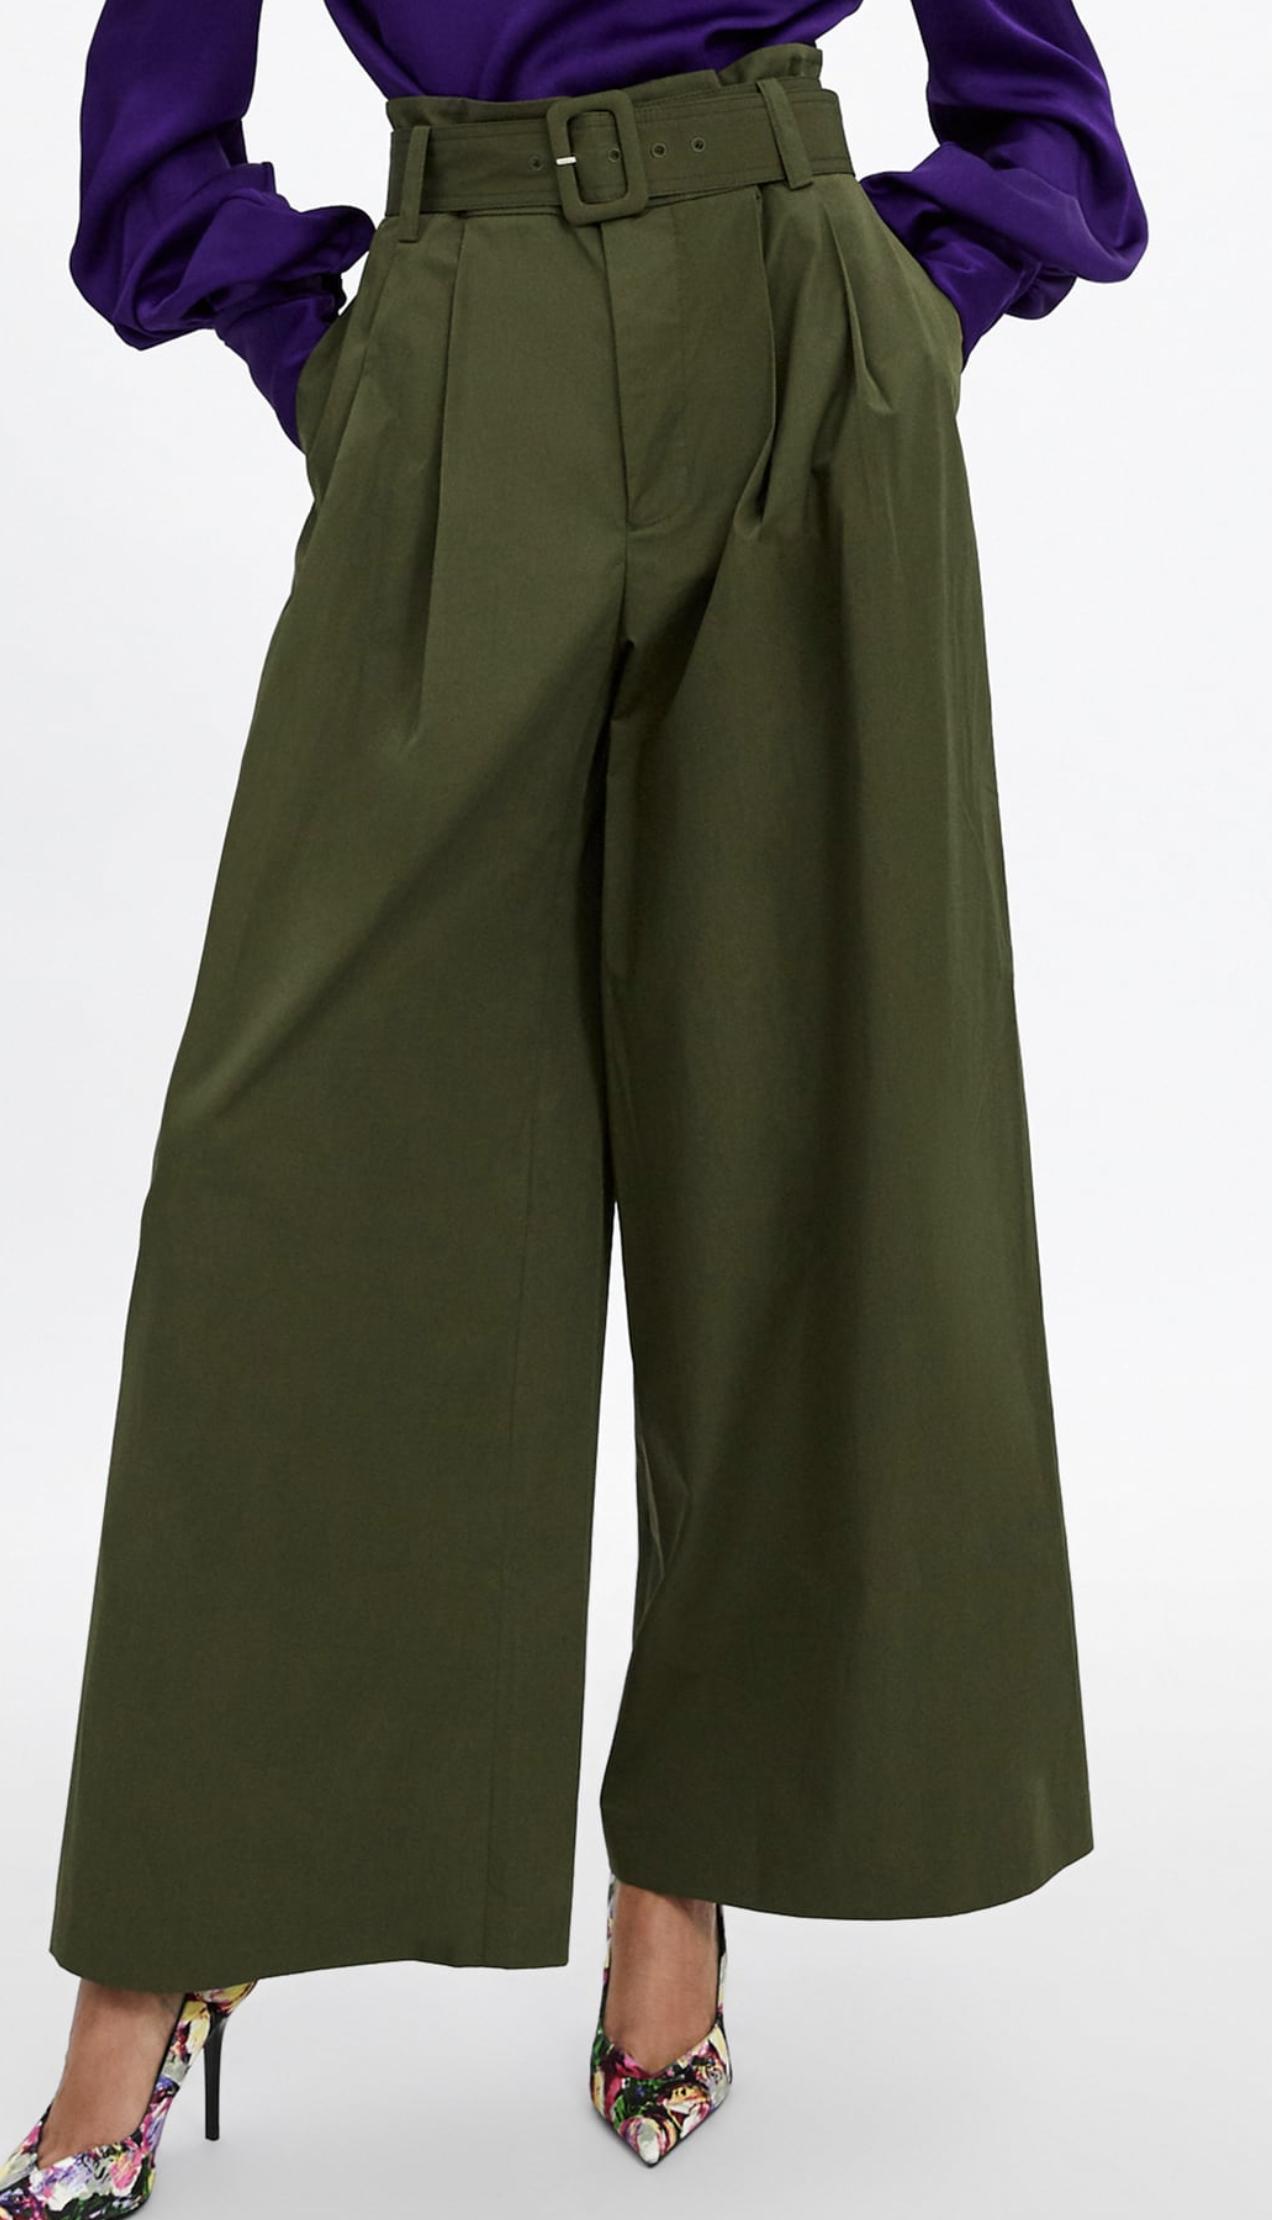 Zara High-waisted wide leg pants with self-belt.